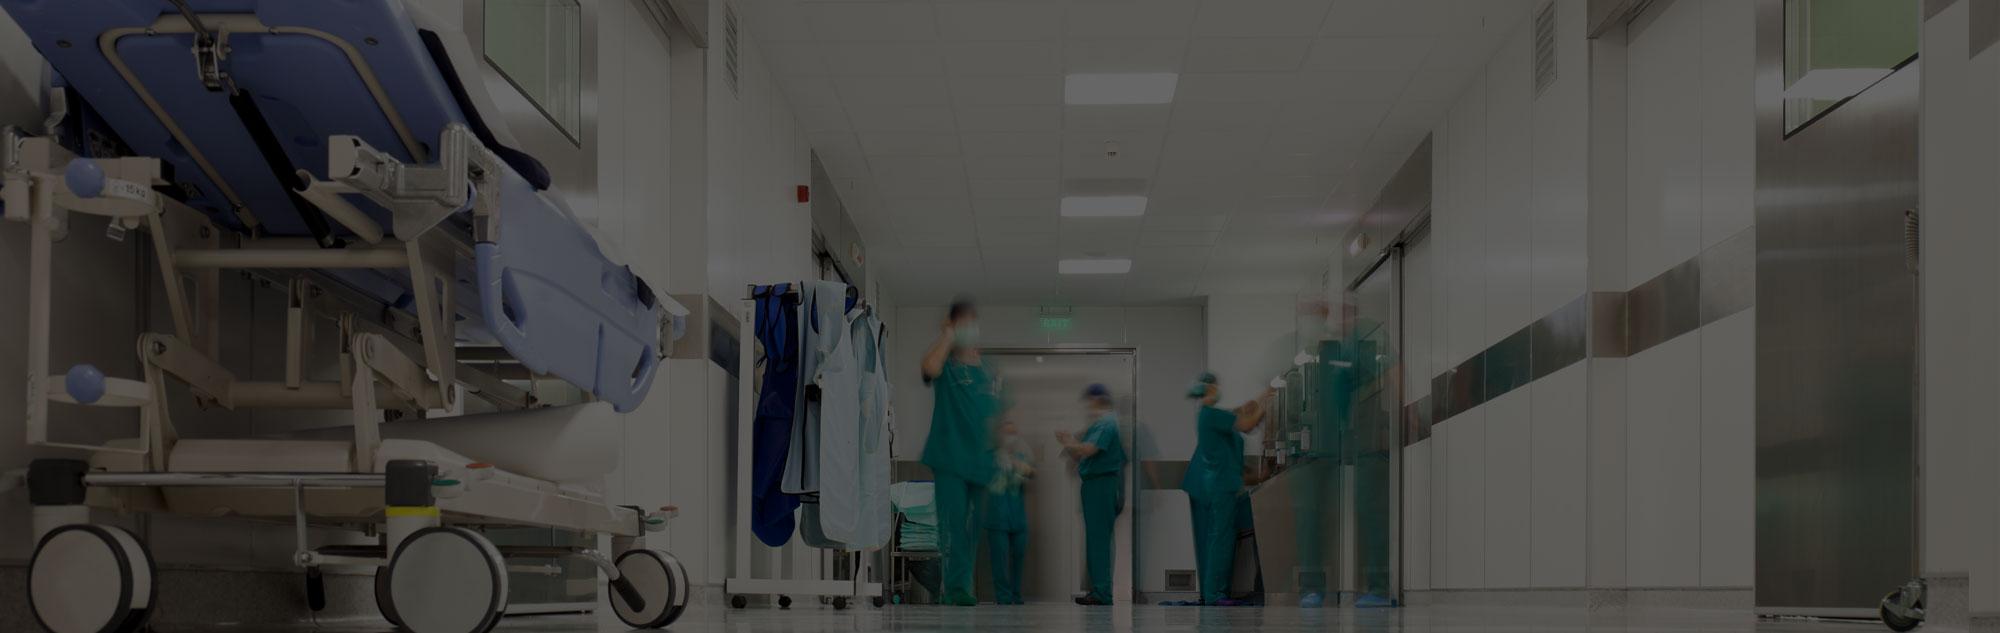 specialty-hospitals-2